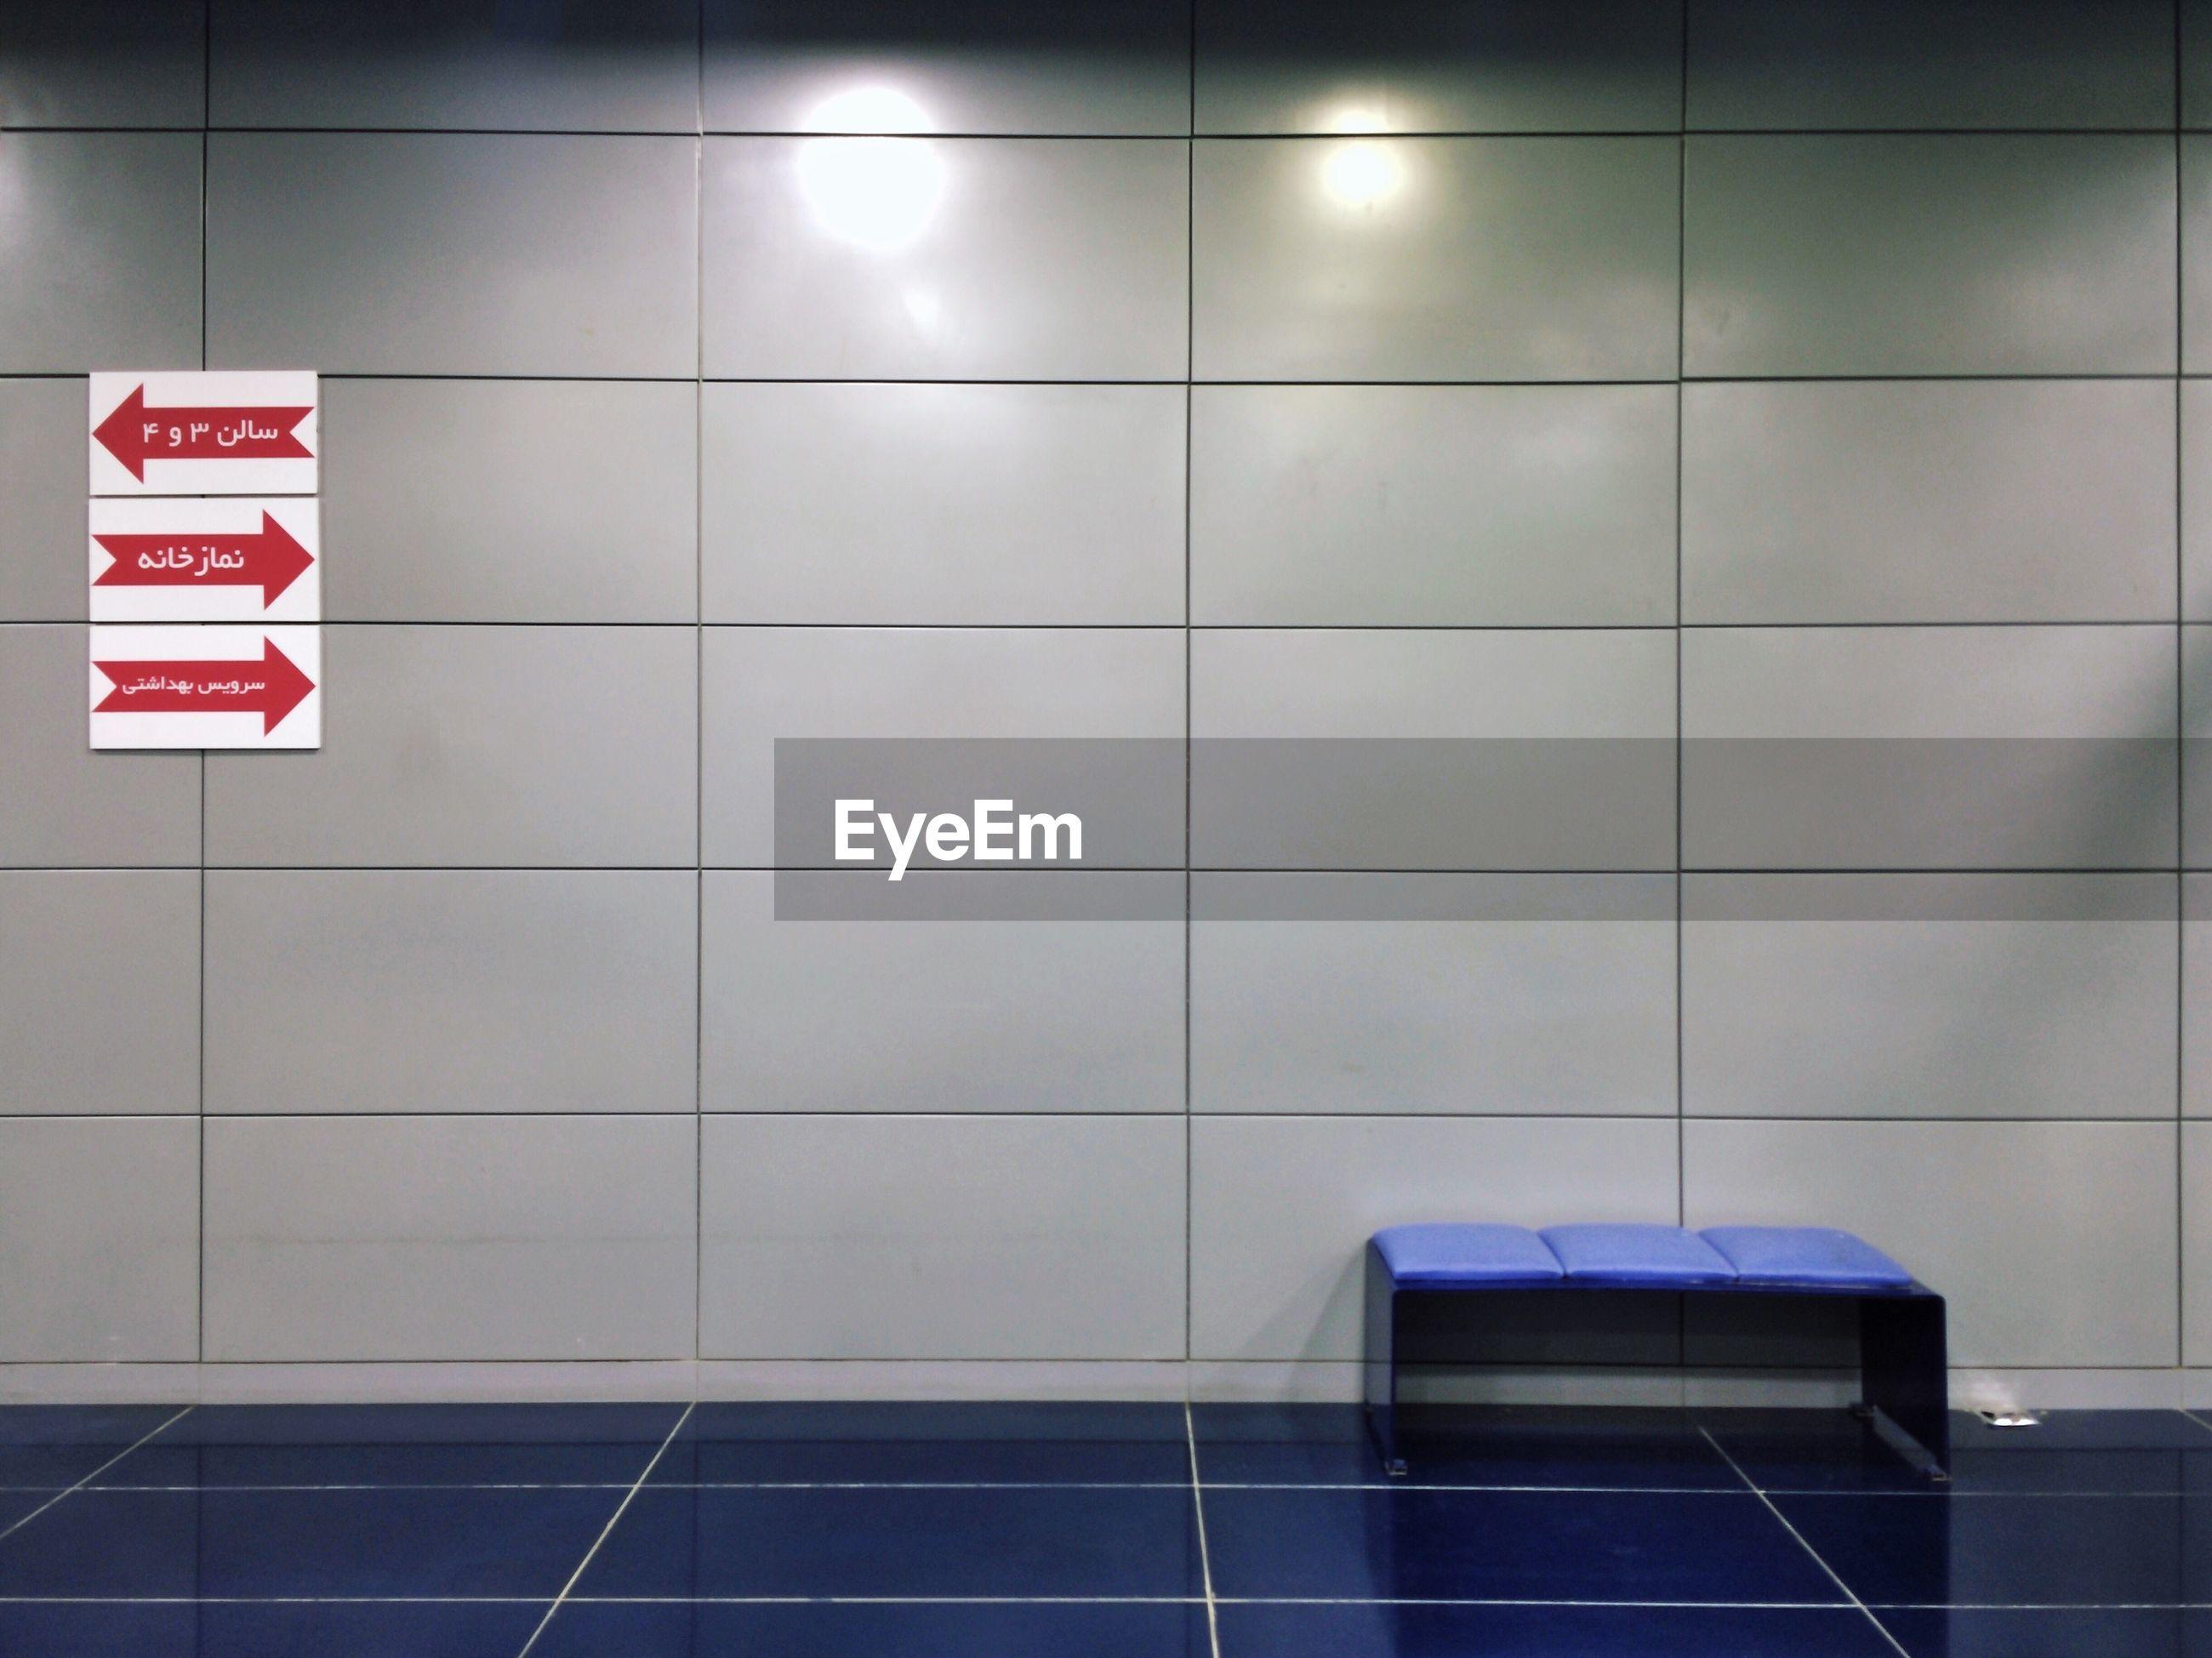 INFORMATION SIGN ON TILED FLOOR IN ILLUMINATED ROOM